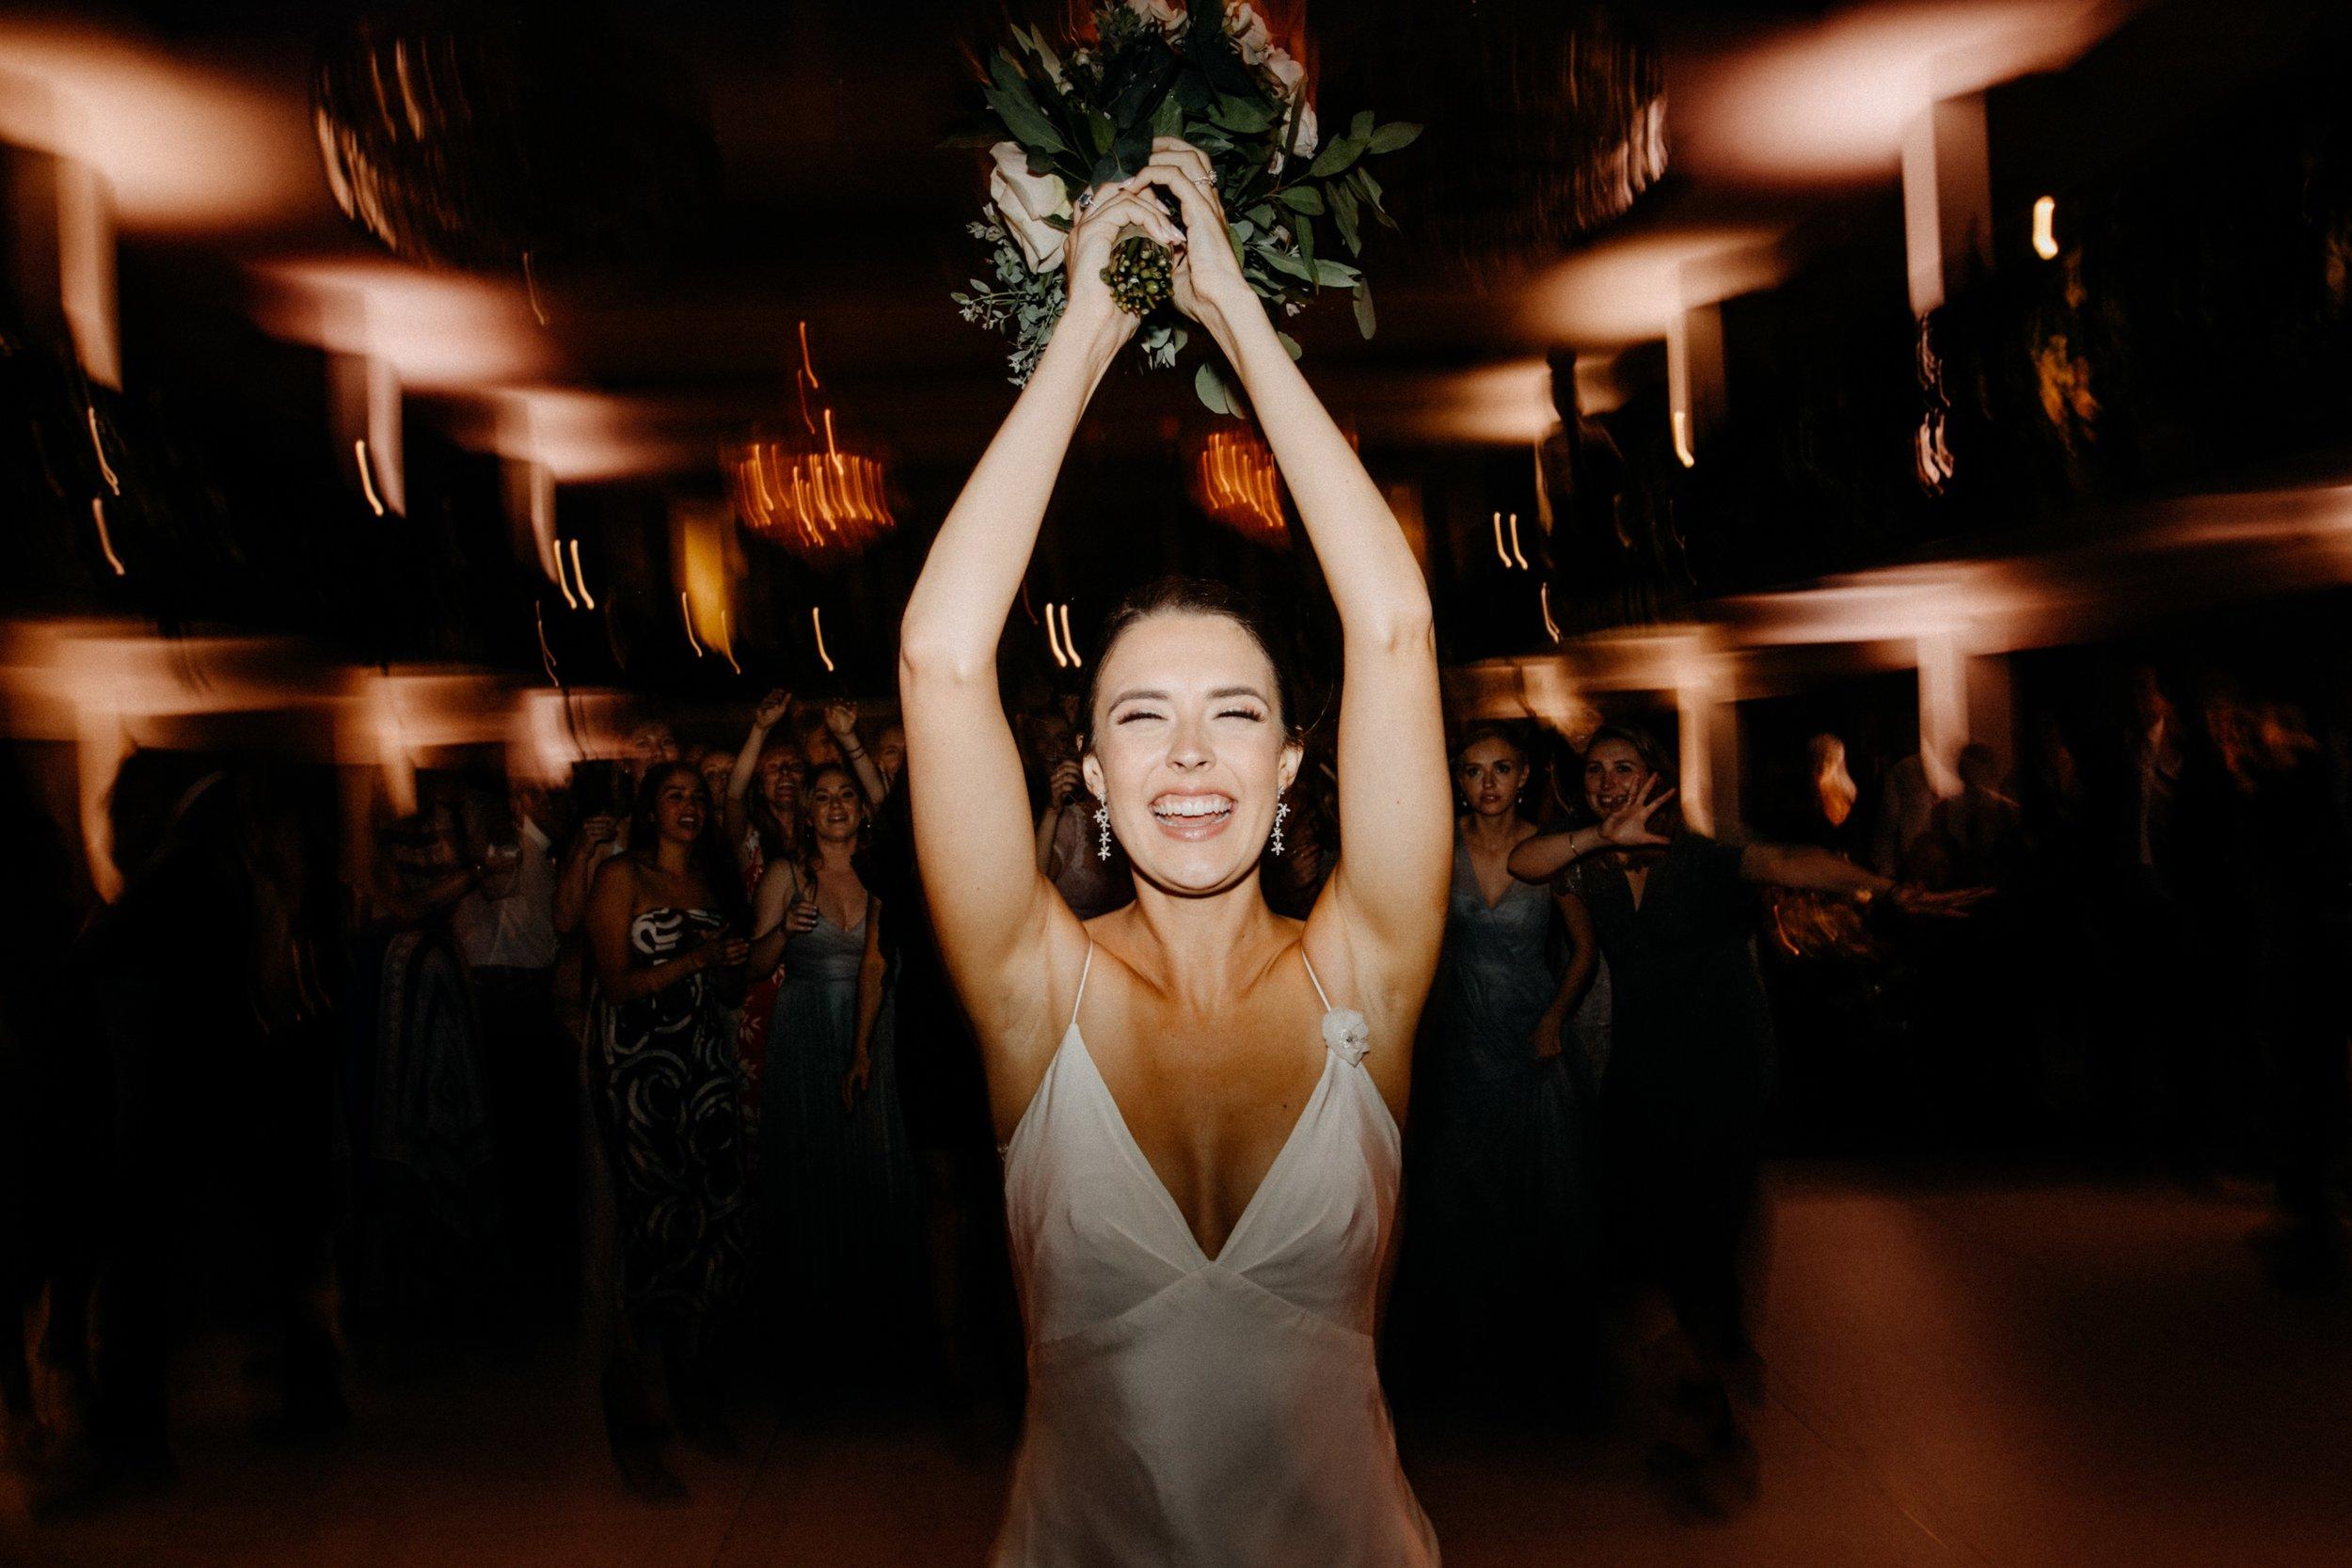 st-anthony-hotel-wedding-photography-10177san-antonio.JPG